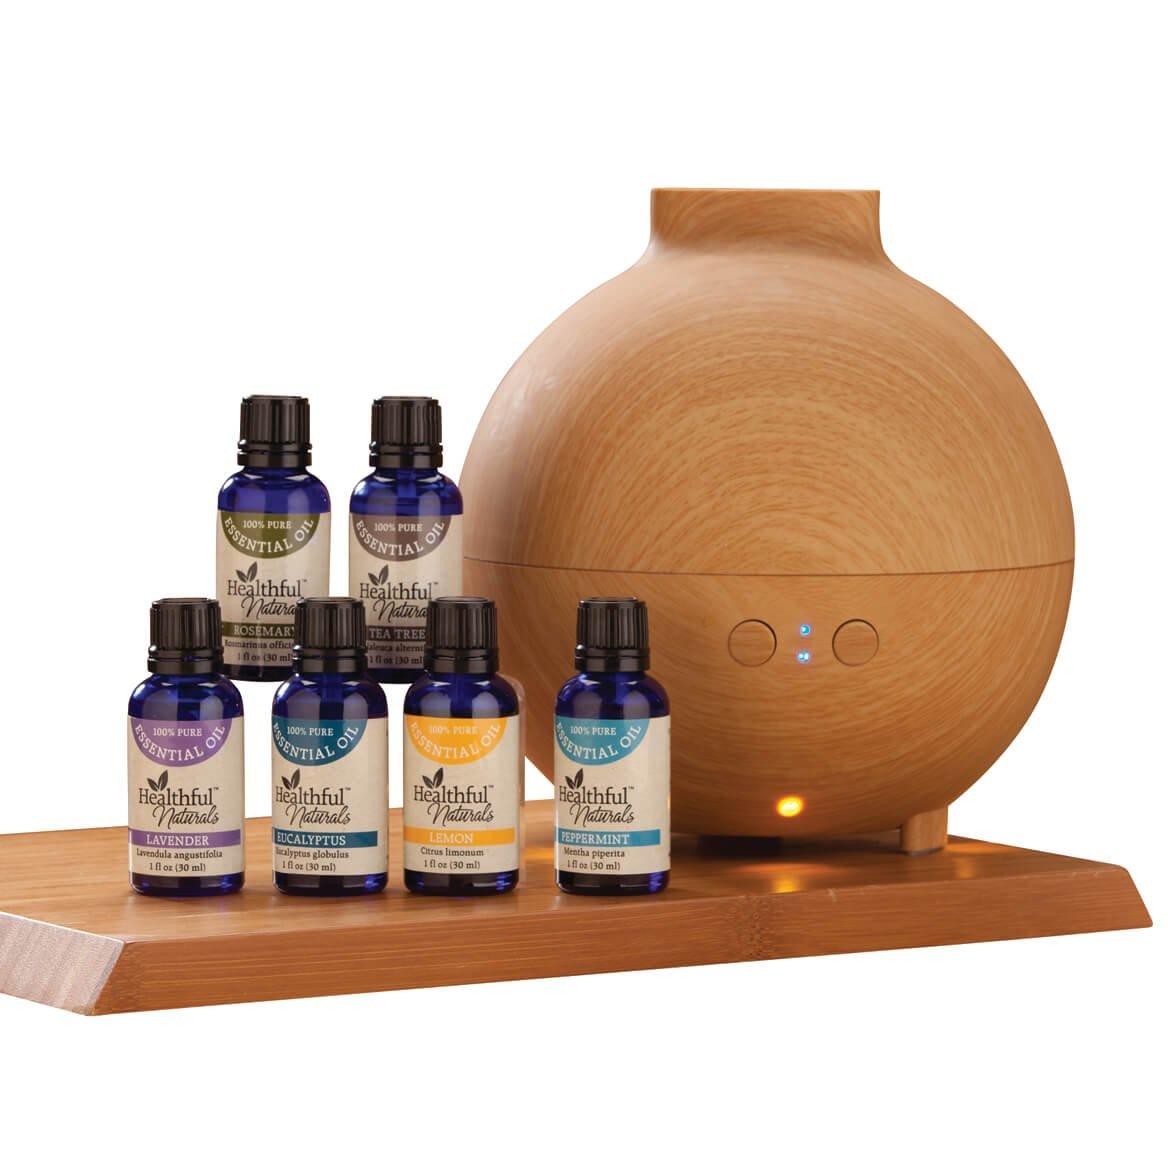 HealthfulTM Naturals Starter Kit & 600 ml Diffuser